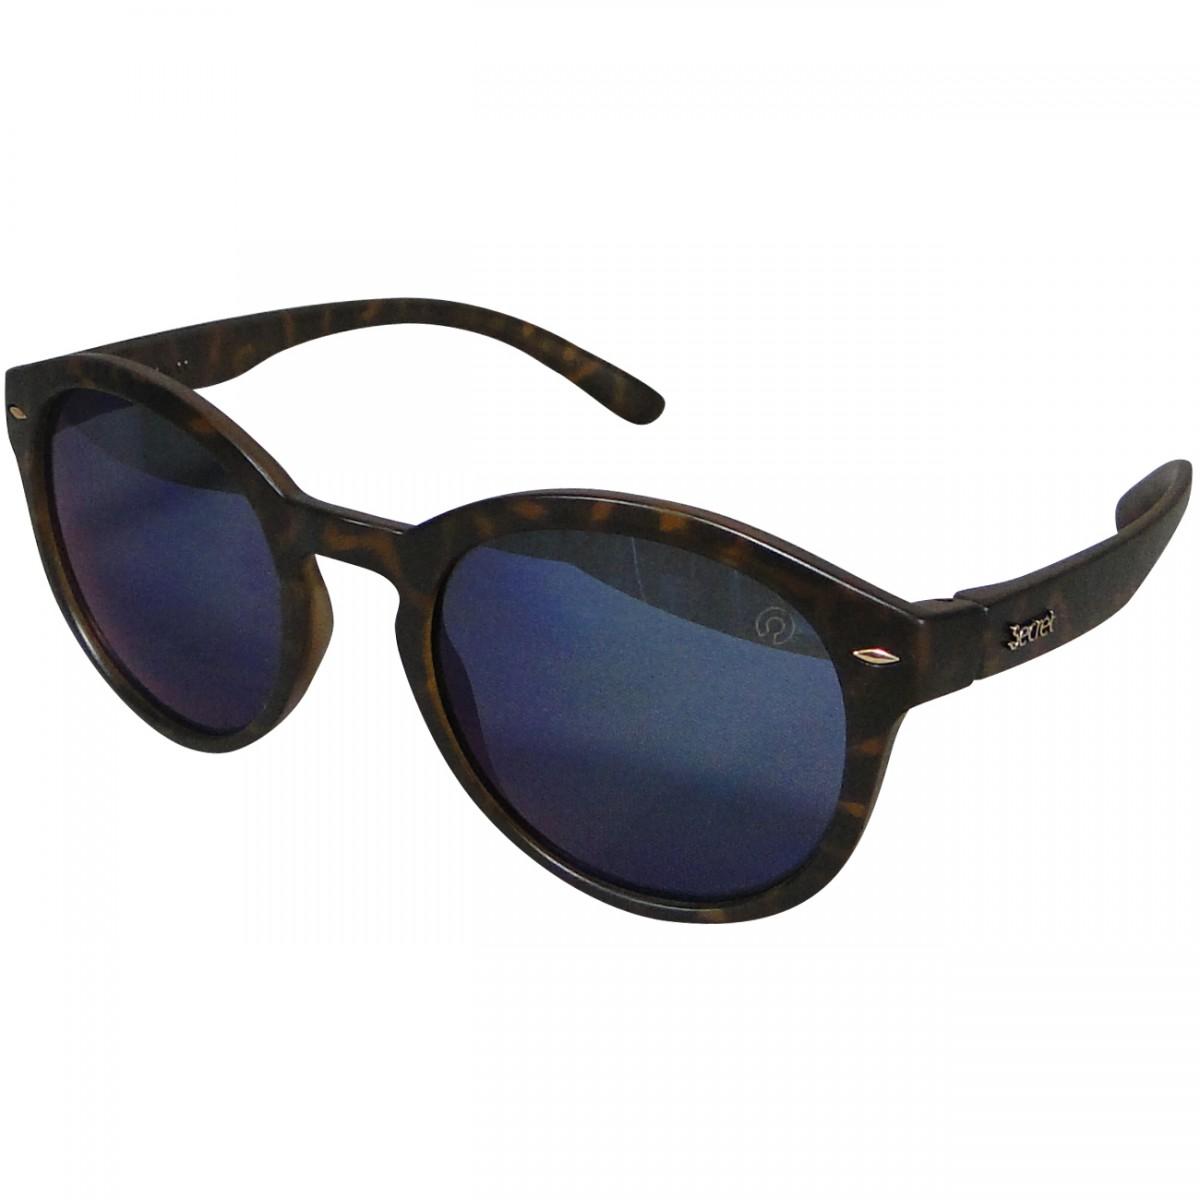 63e2d21bc Oculos Secret Wannabe 9663376587 - Havana/Turtle - Chuteira Nike, Adidas.  Sandalias Femininas. Sandy Calçados